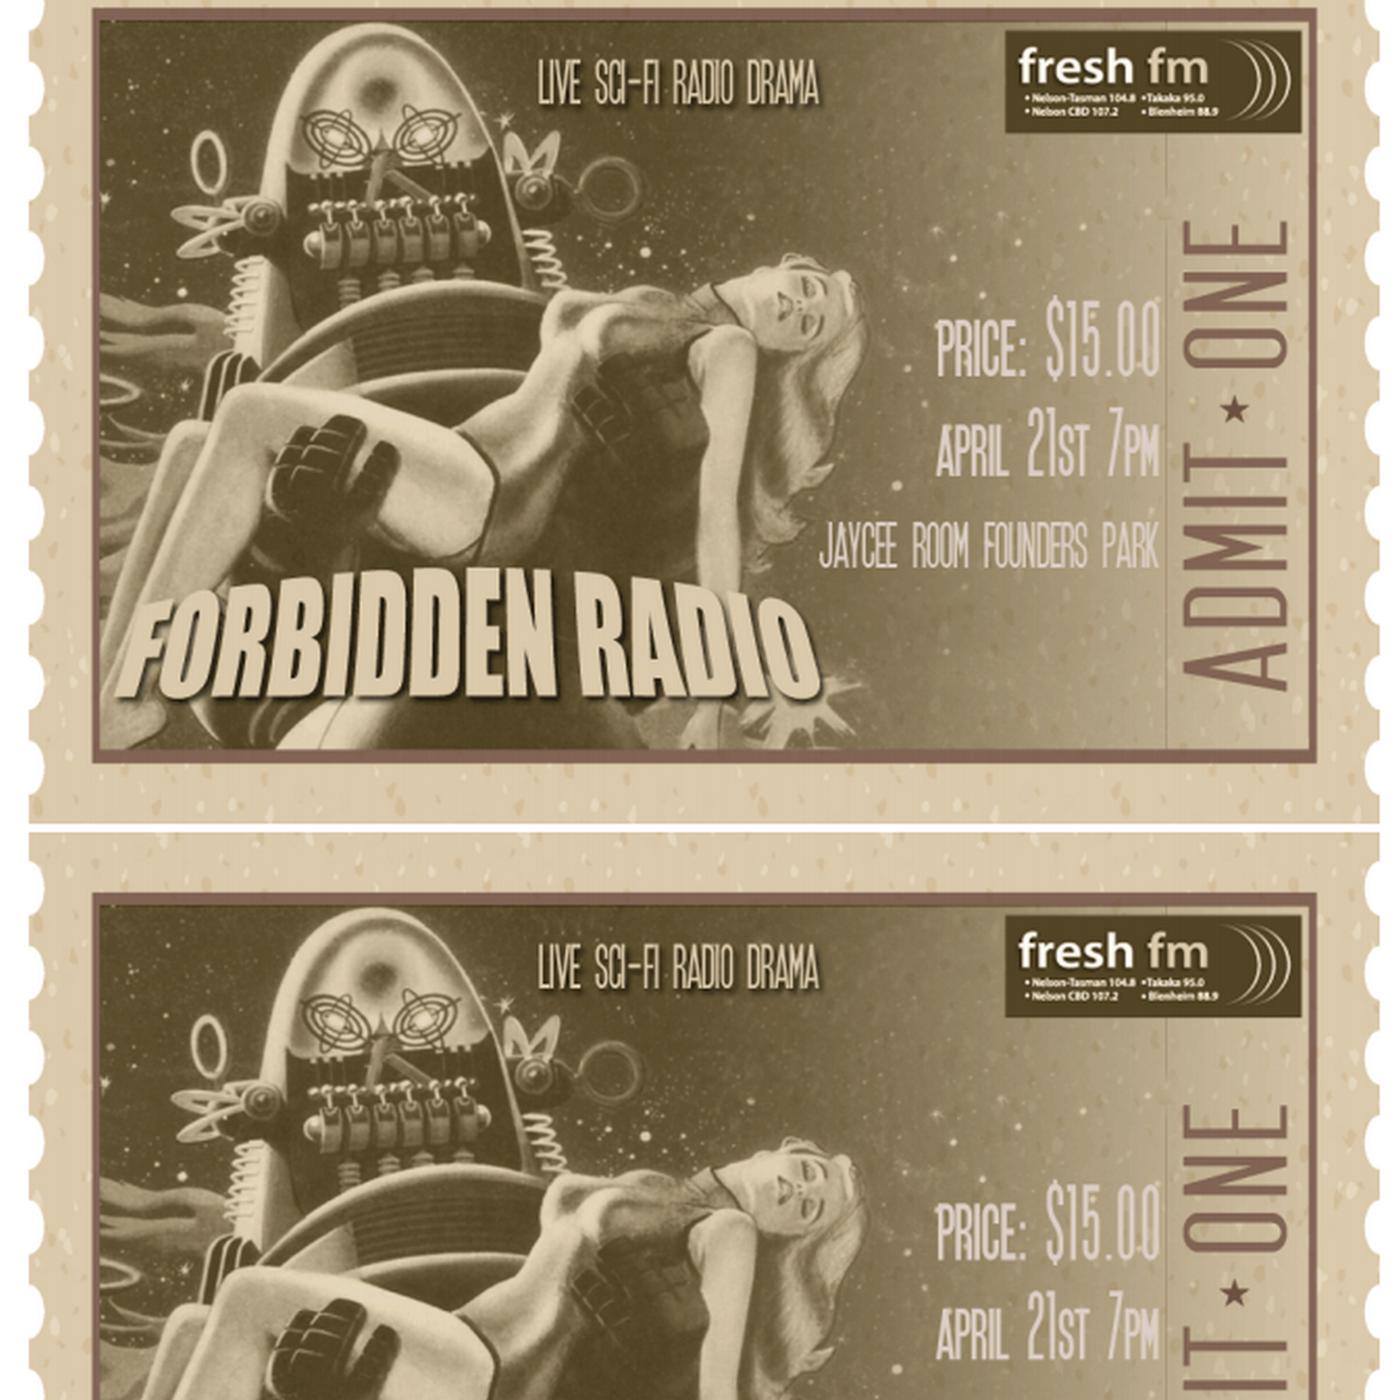 https://cdn.accessradio.org/StationFolder/freshfm/Images/Forbidden-Radio-Ticket.png